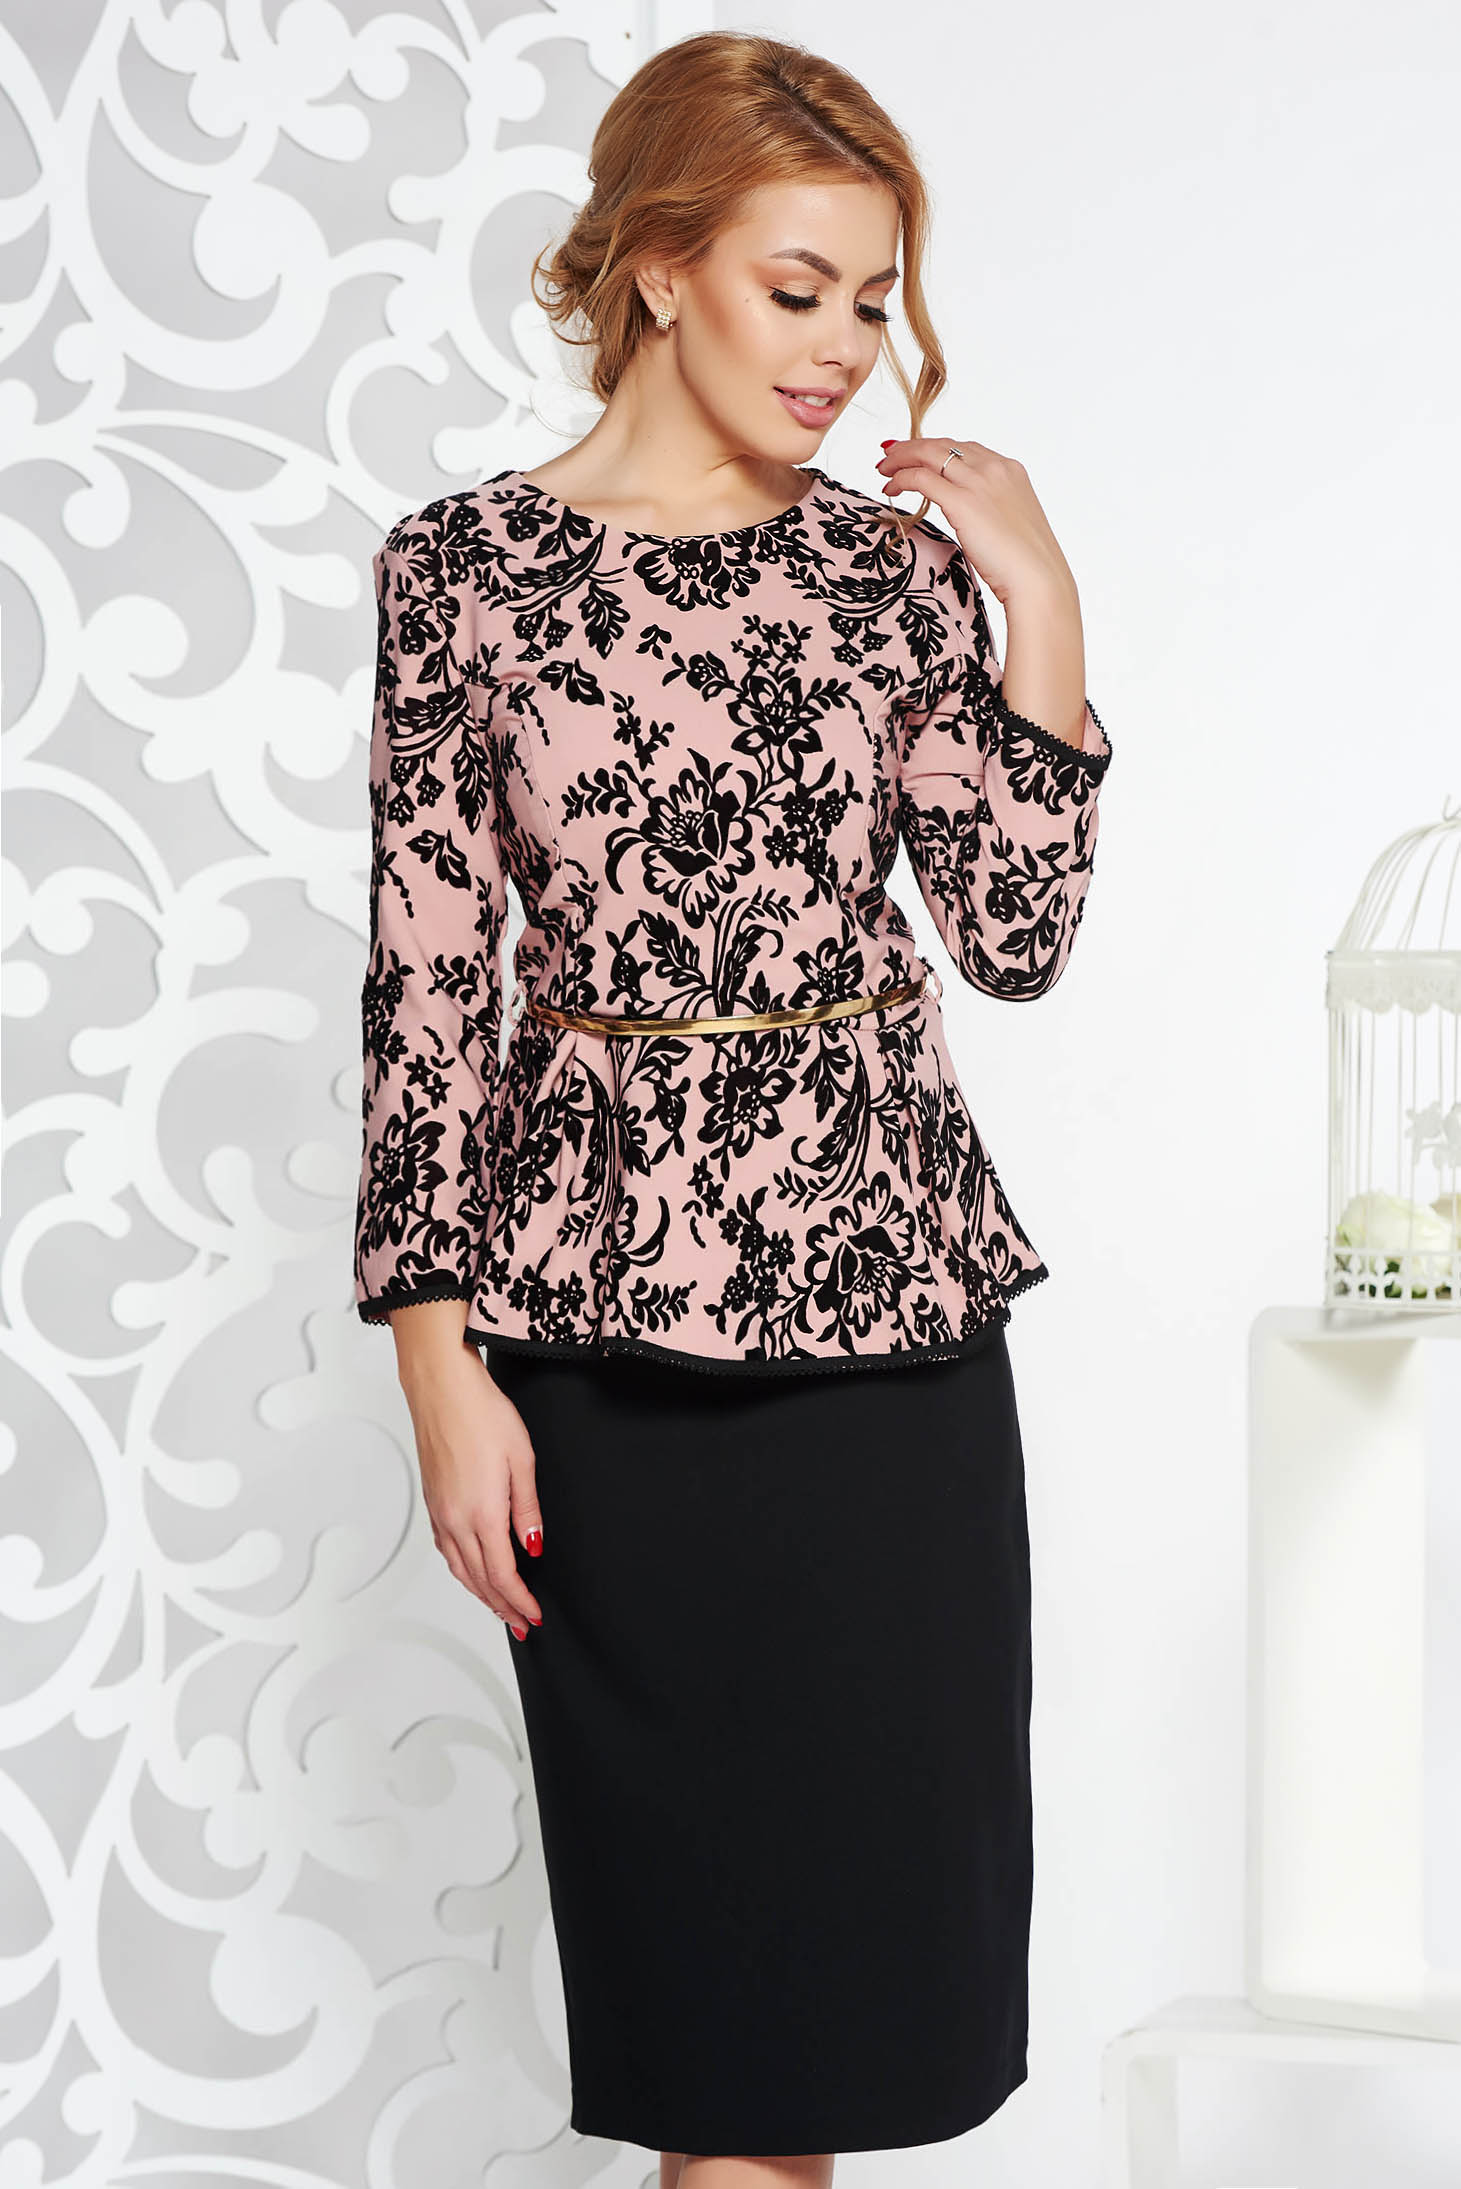 Compleu roz deschis de ocazie din bumbac usor elastic cu fusta conica si bluza cu accesoriu tip curea